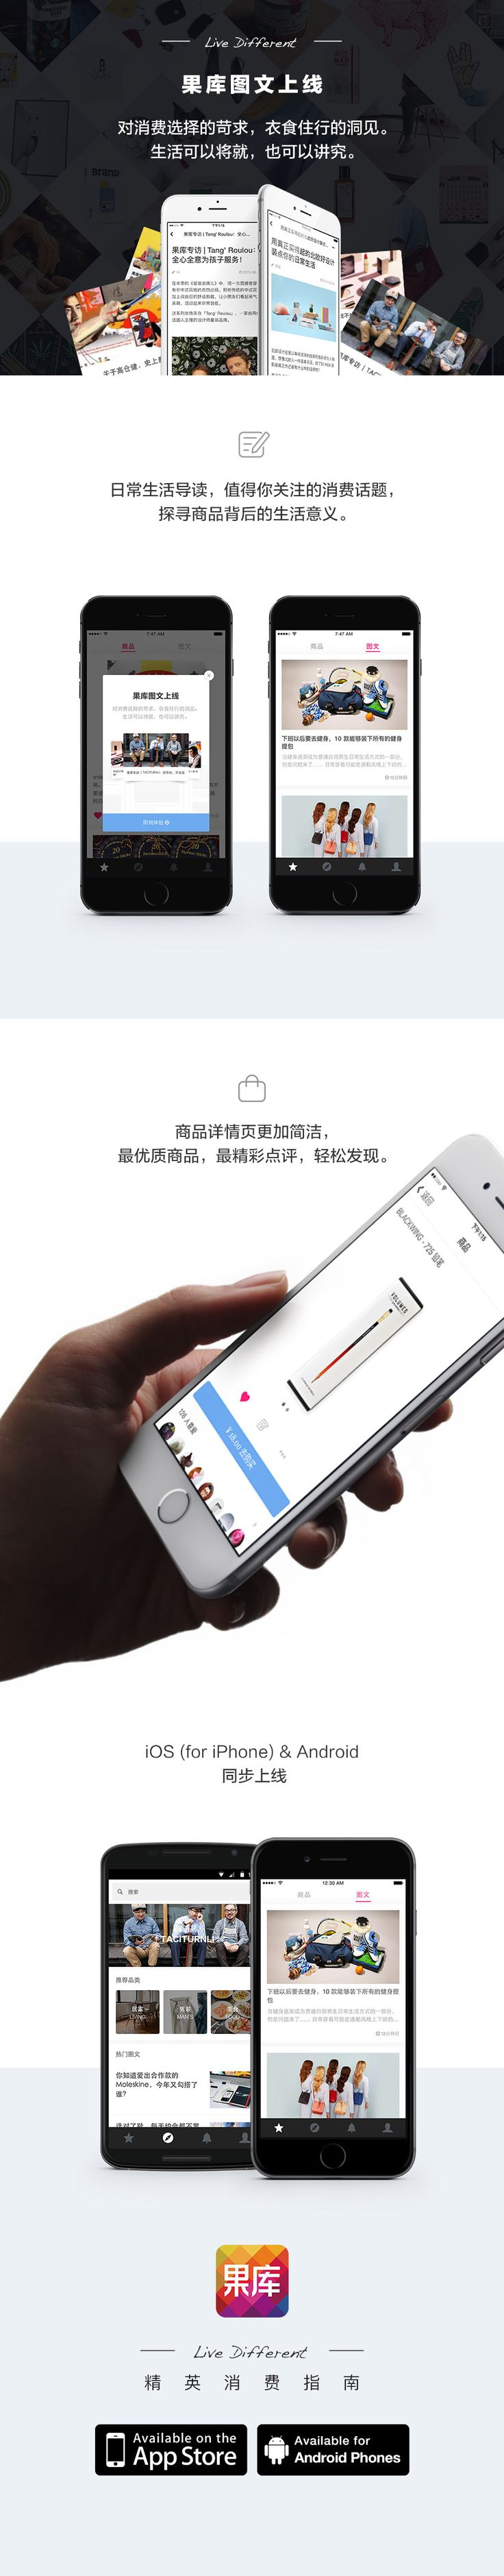 Guoku iOS UI version 4.1 on Behance